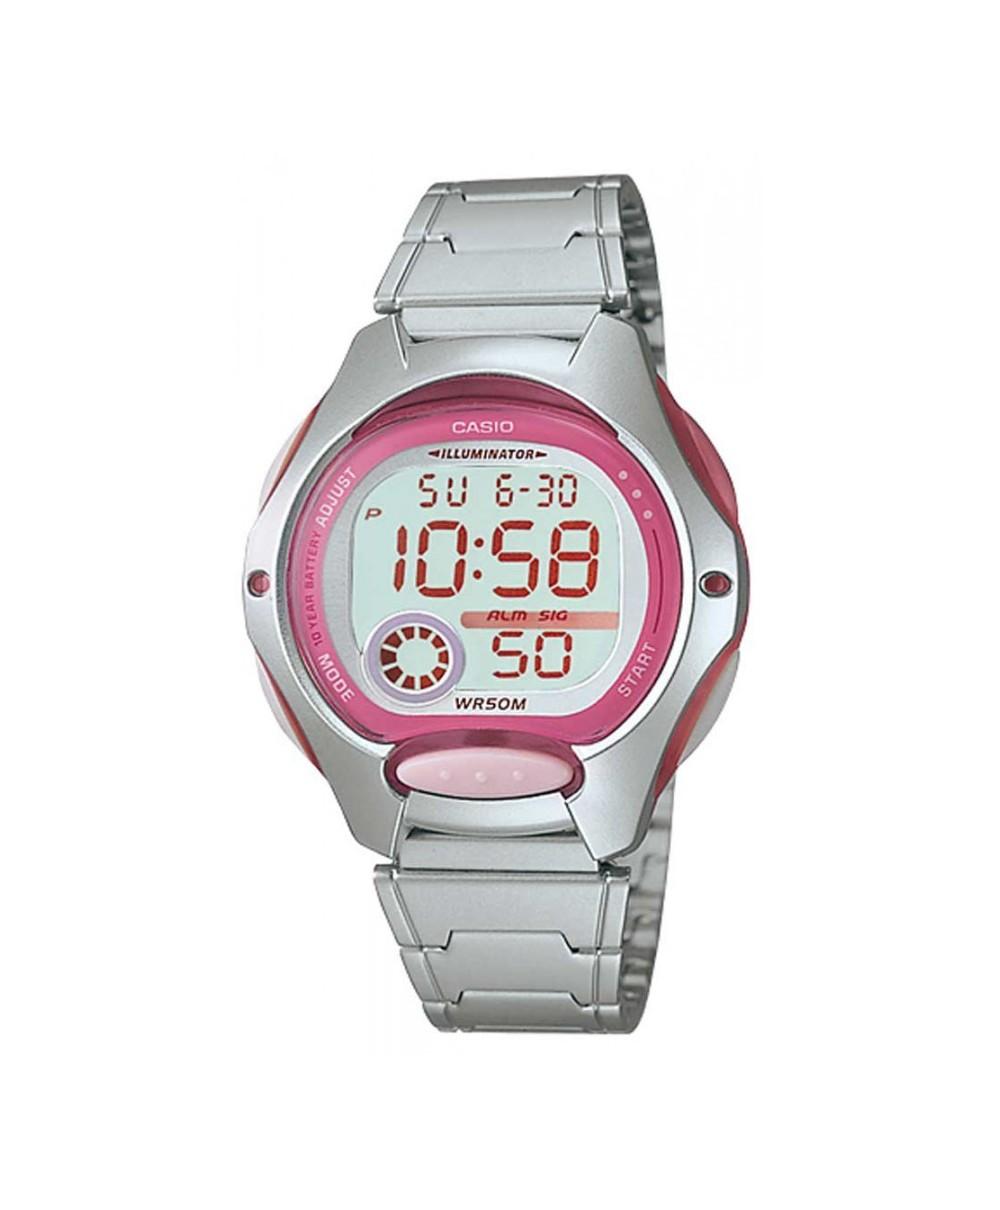 Reloj Casio LW-200D-4A